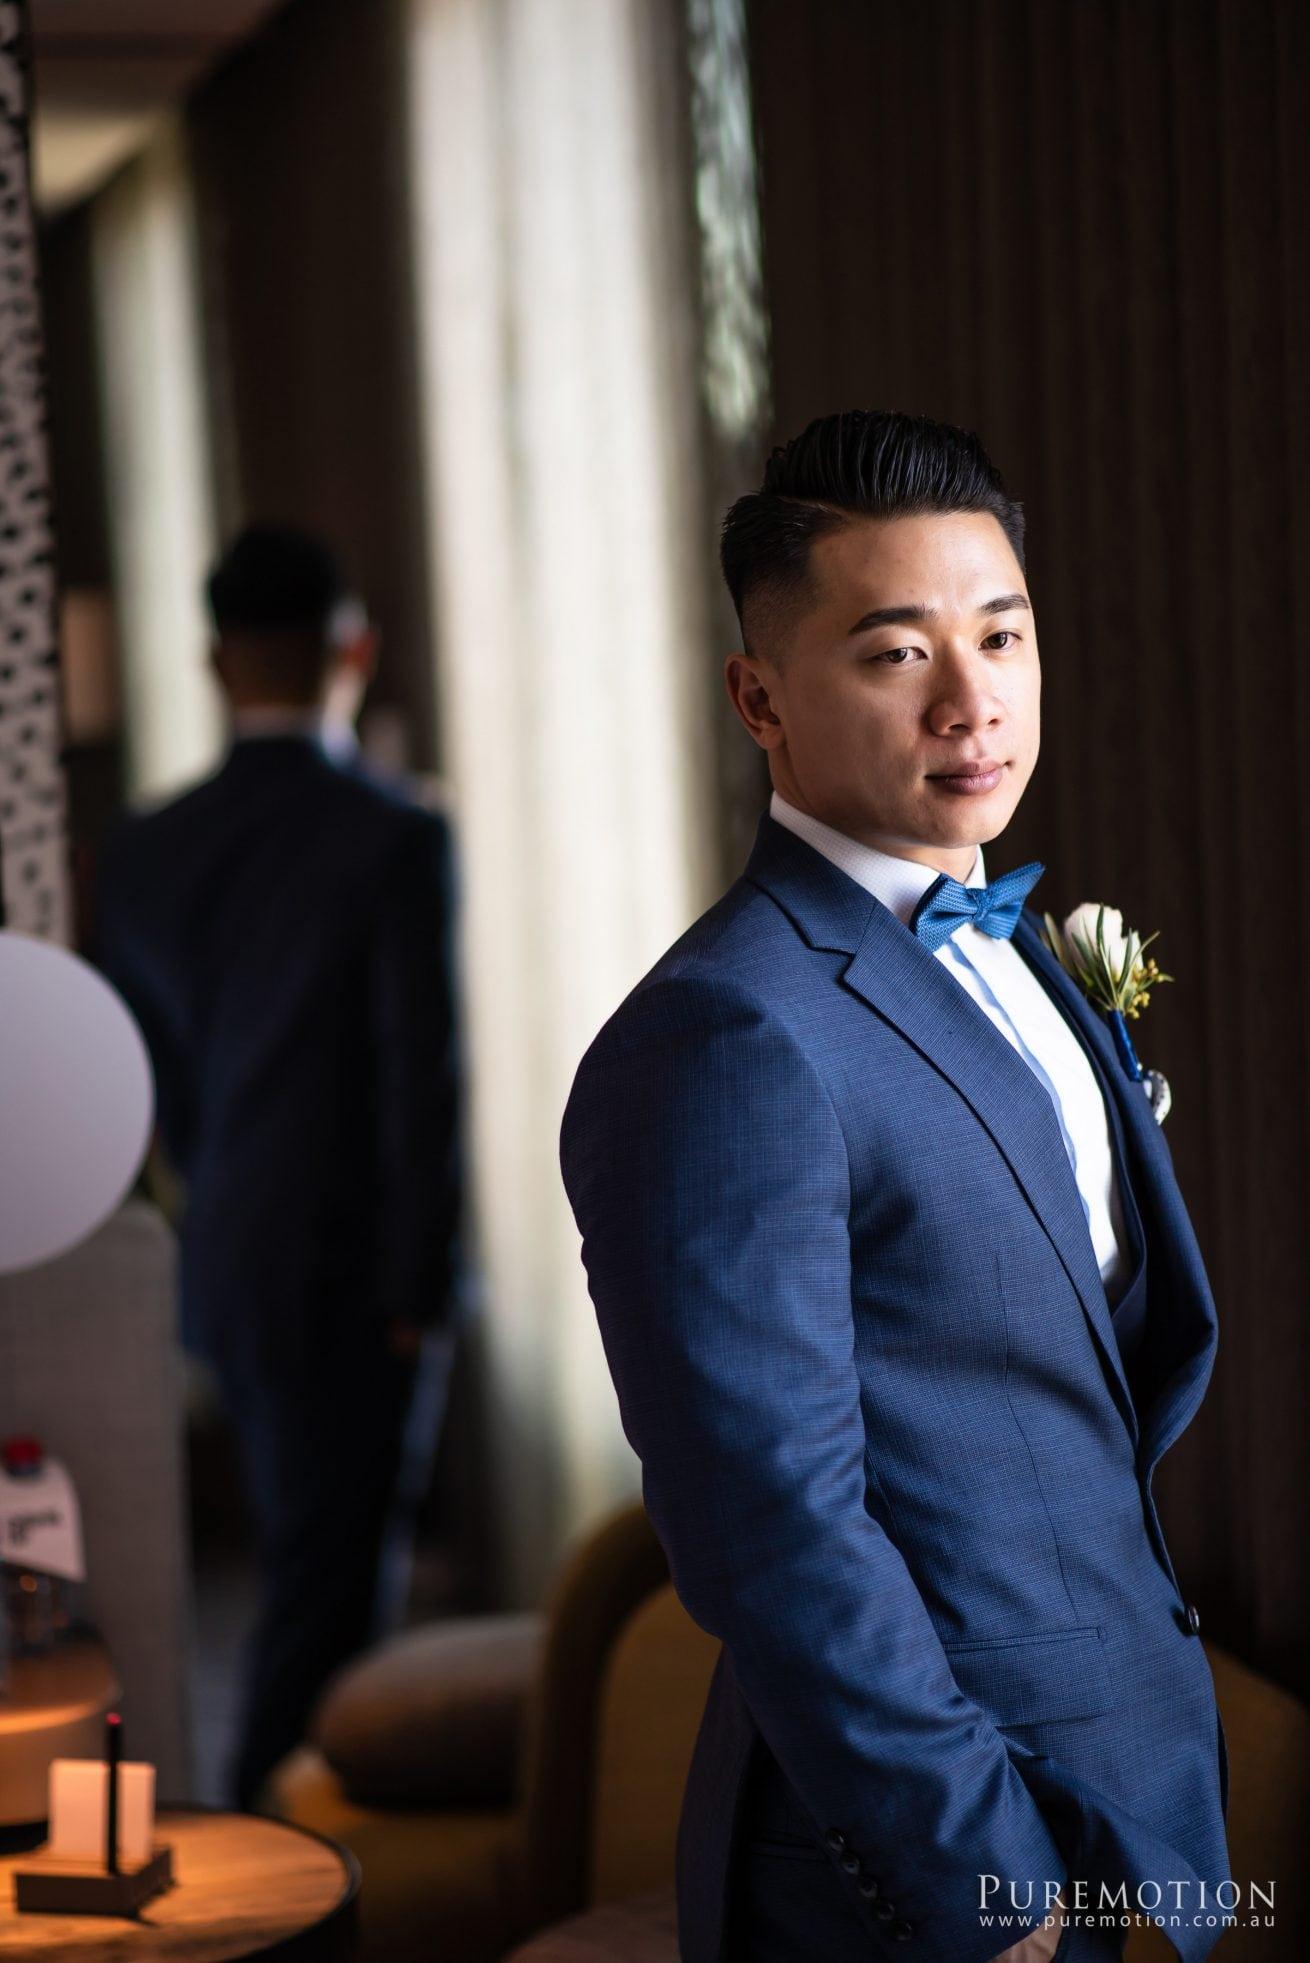 Puremotion Wedding Photography Alex Huang Brisbane W Hotel050